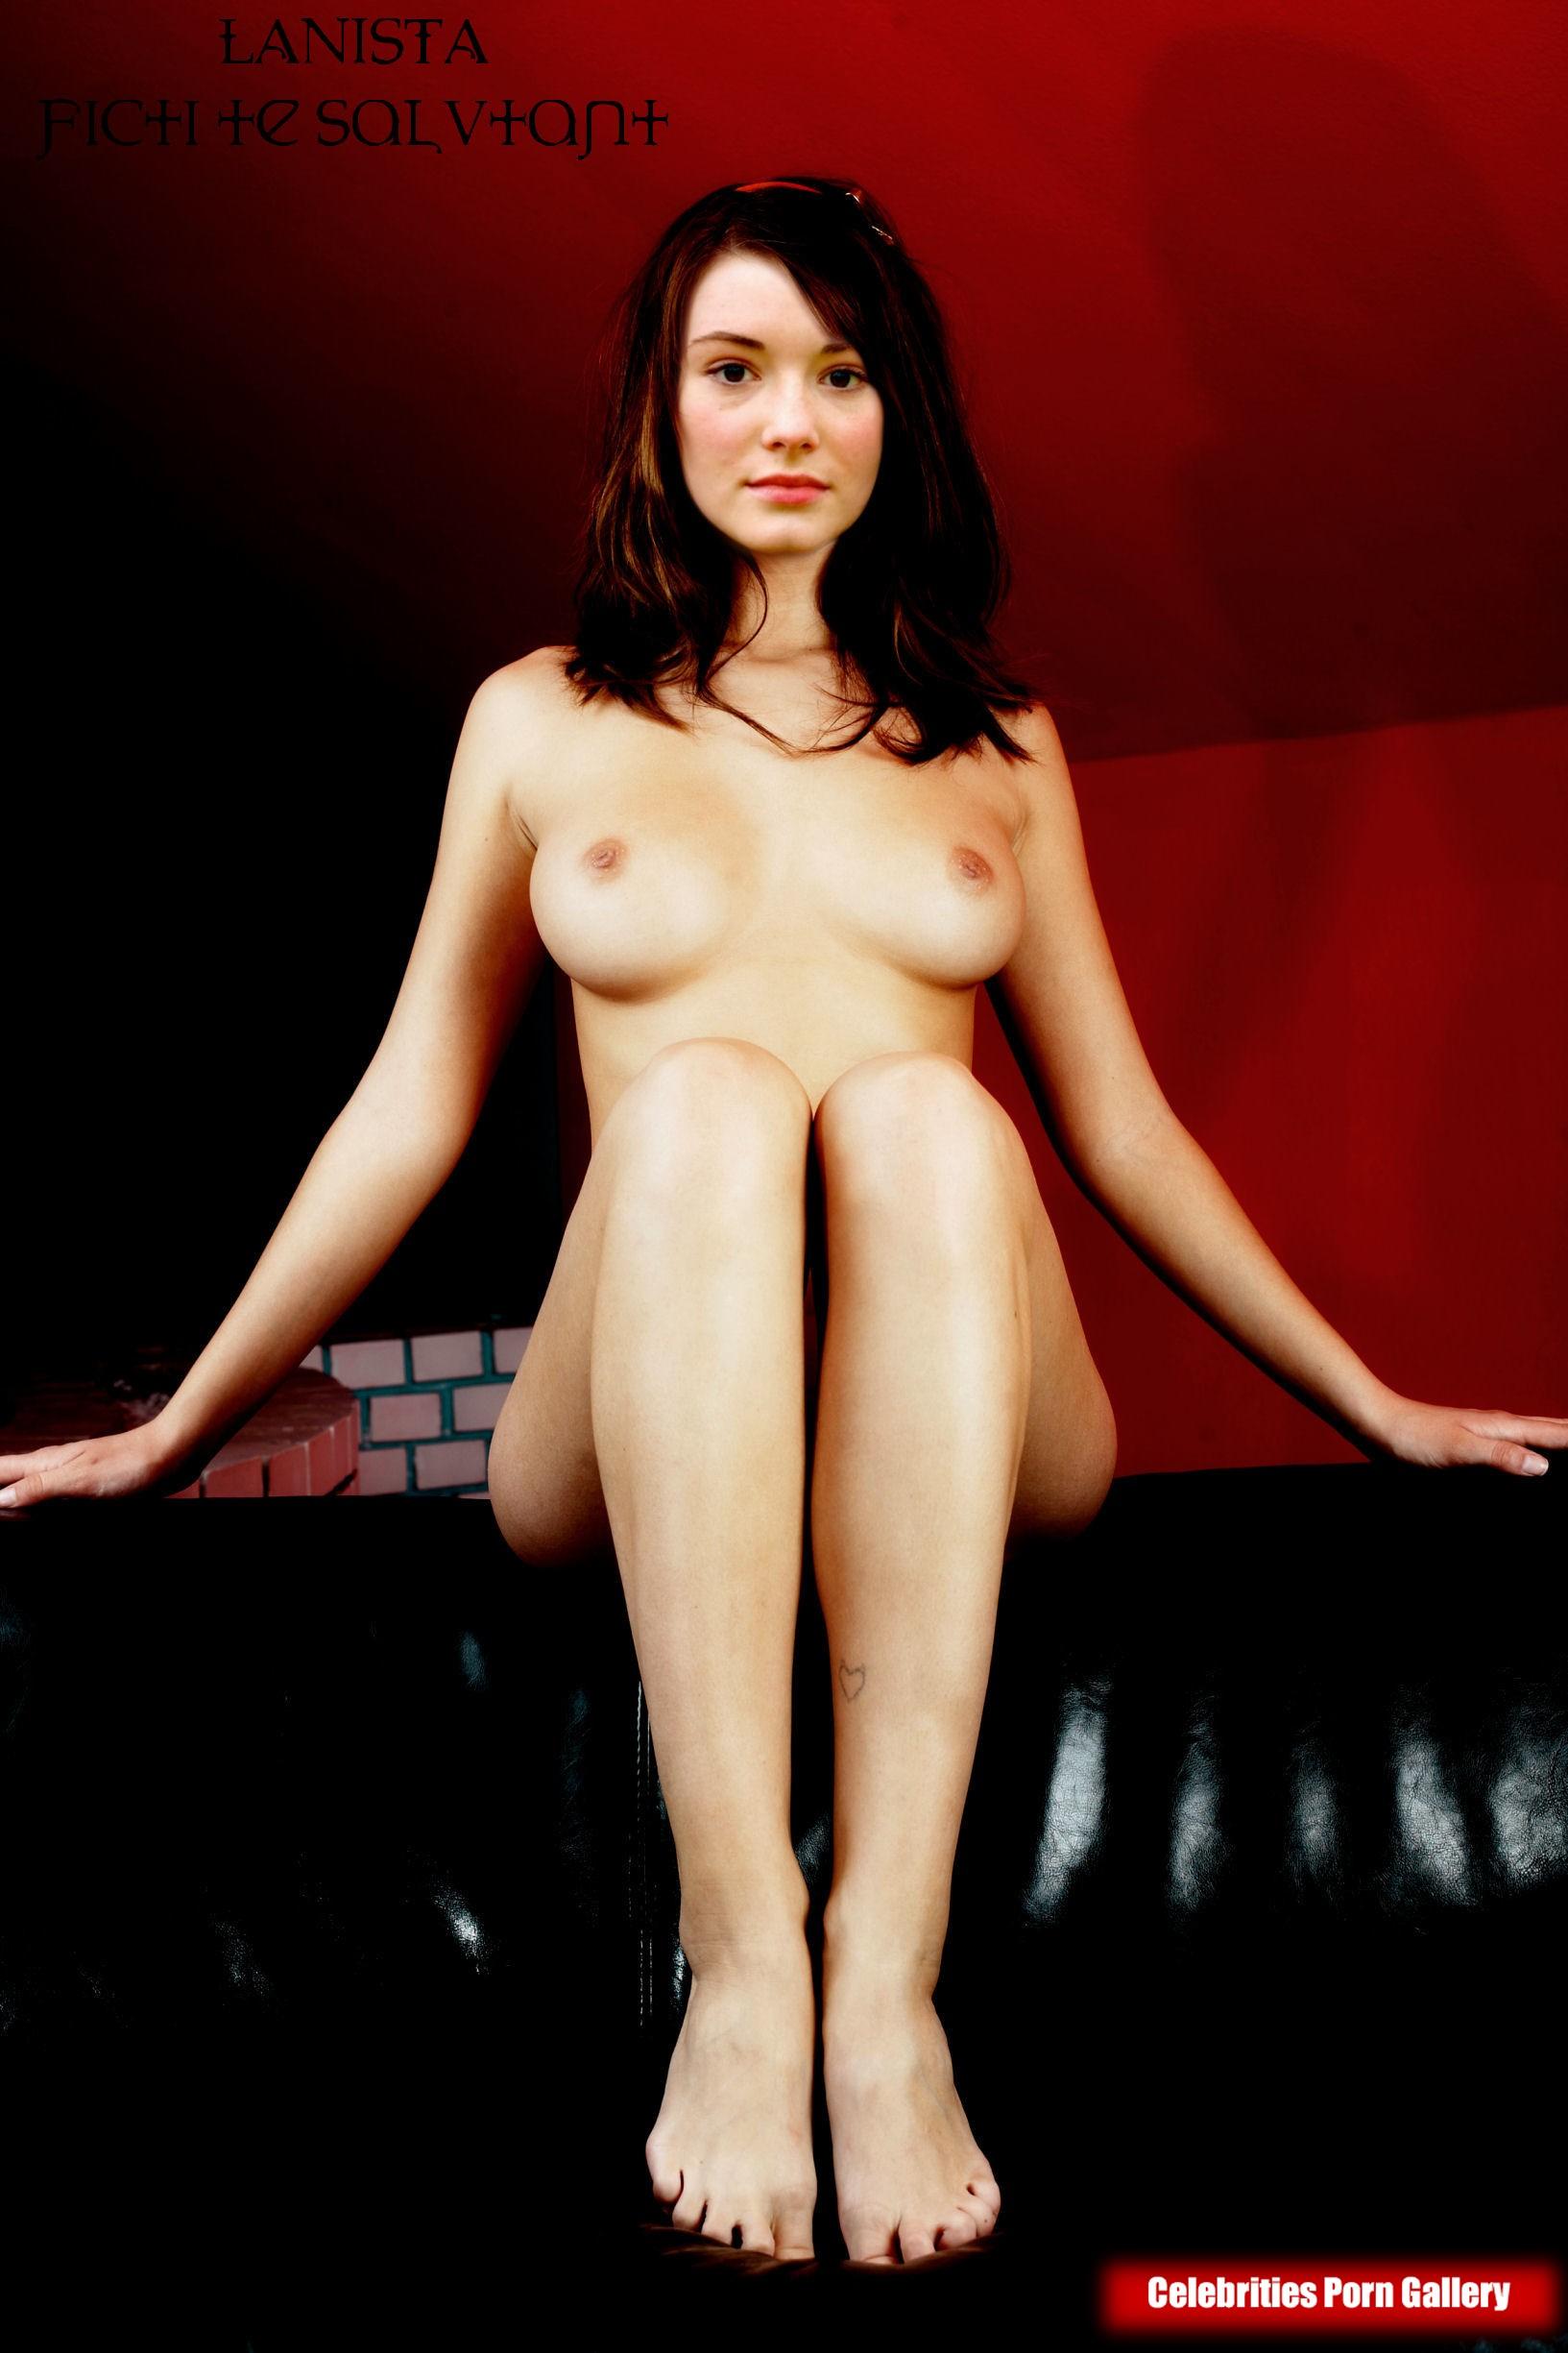 newest celebrity nudes